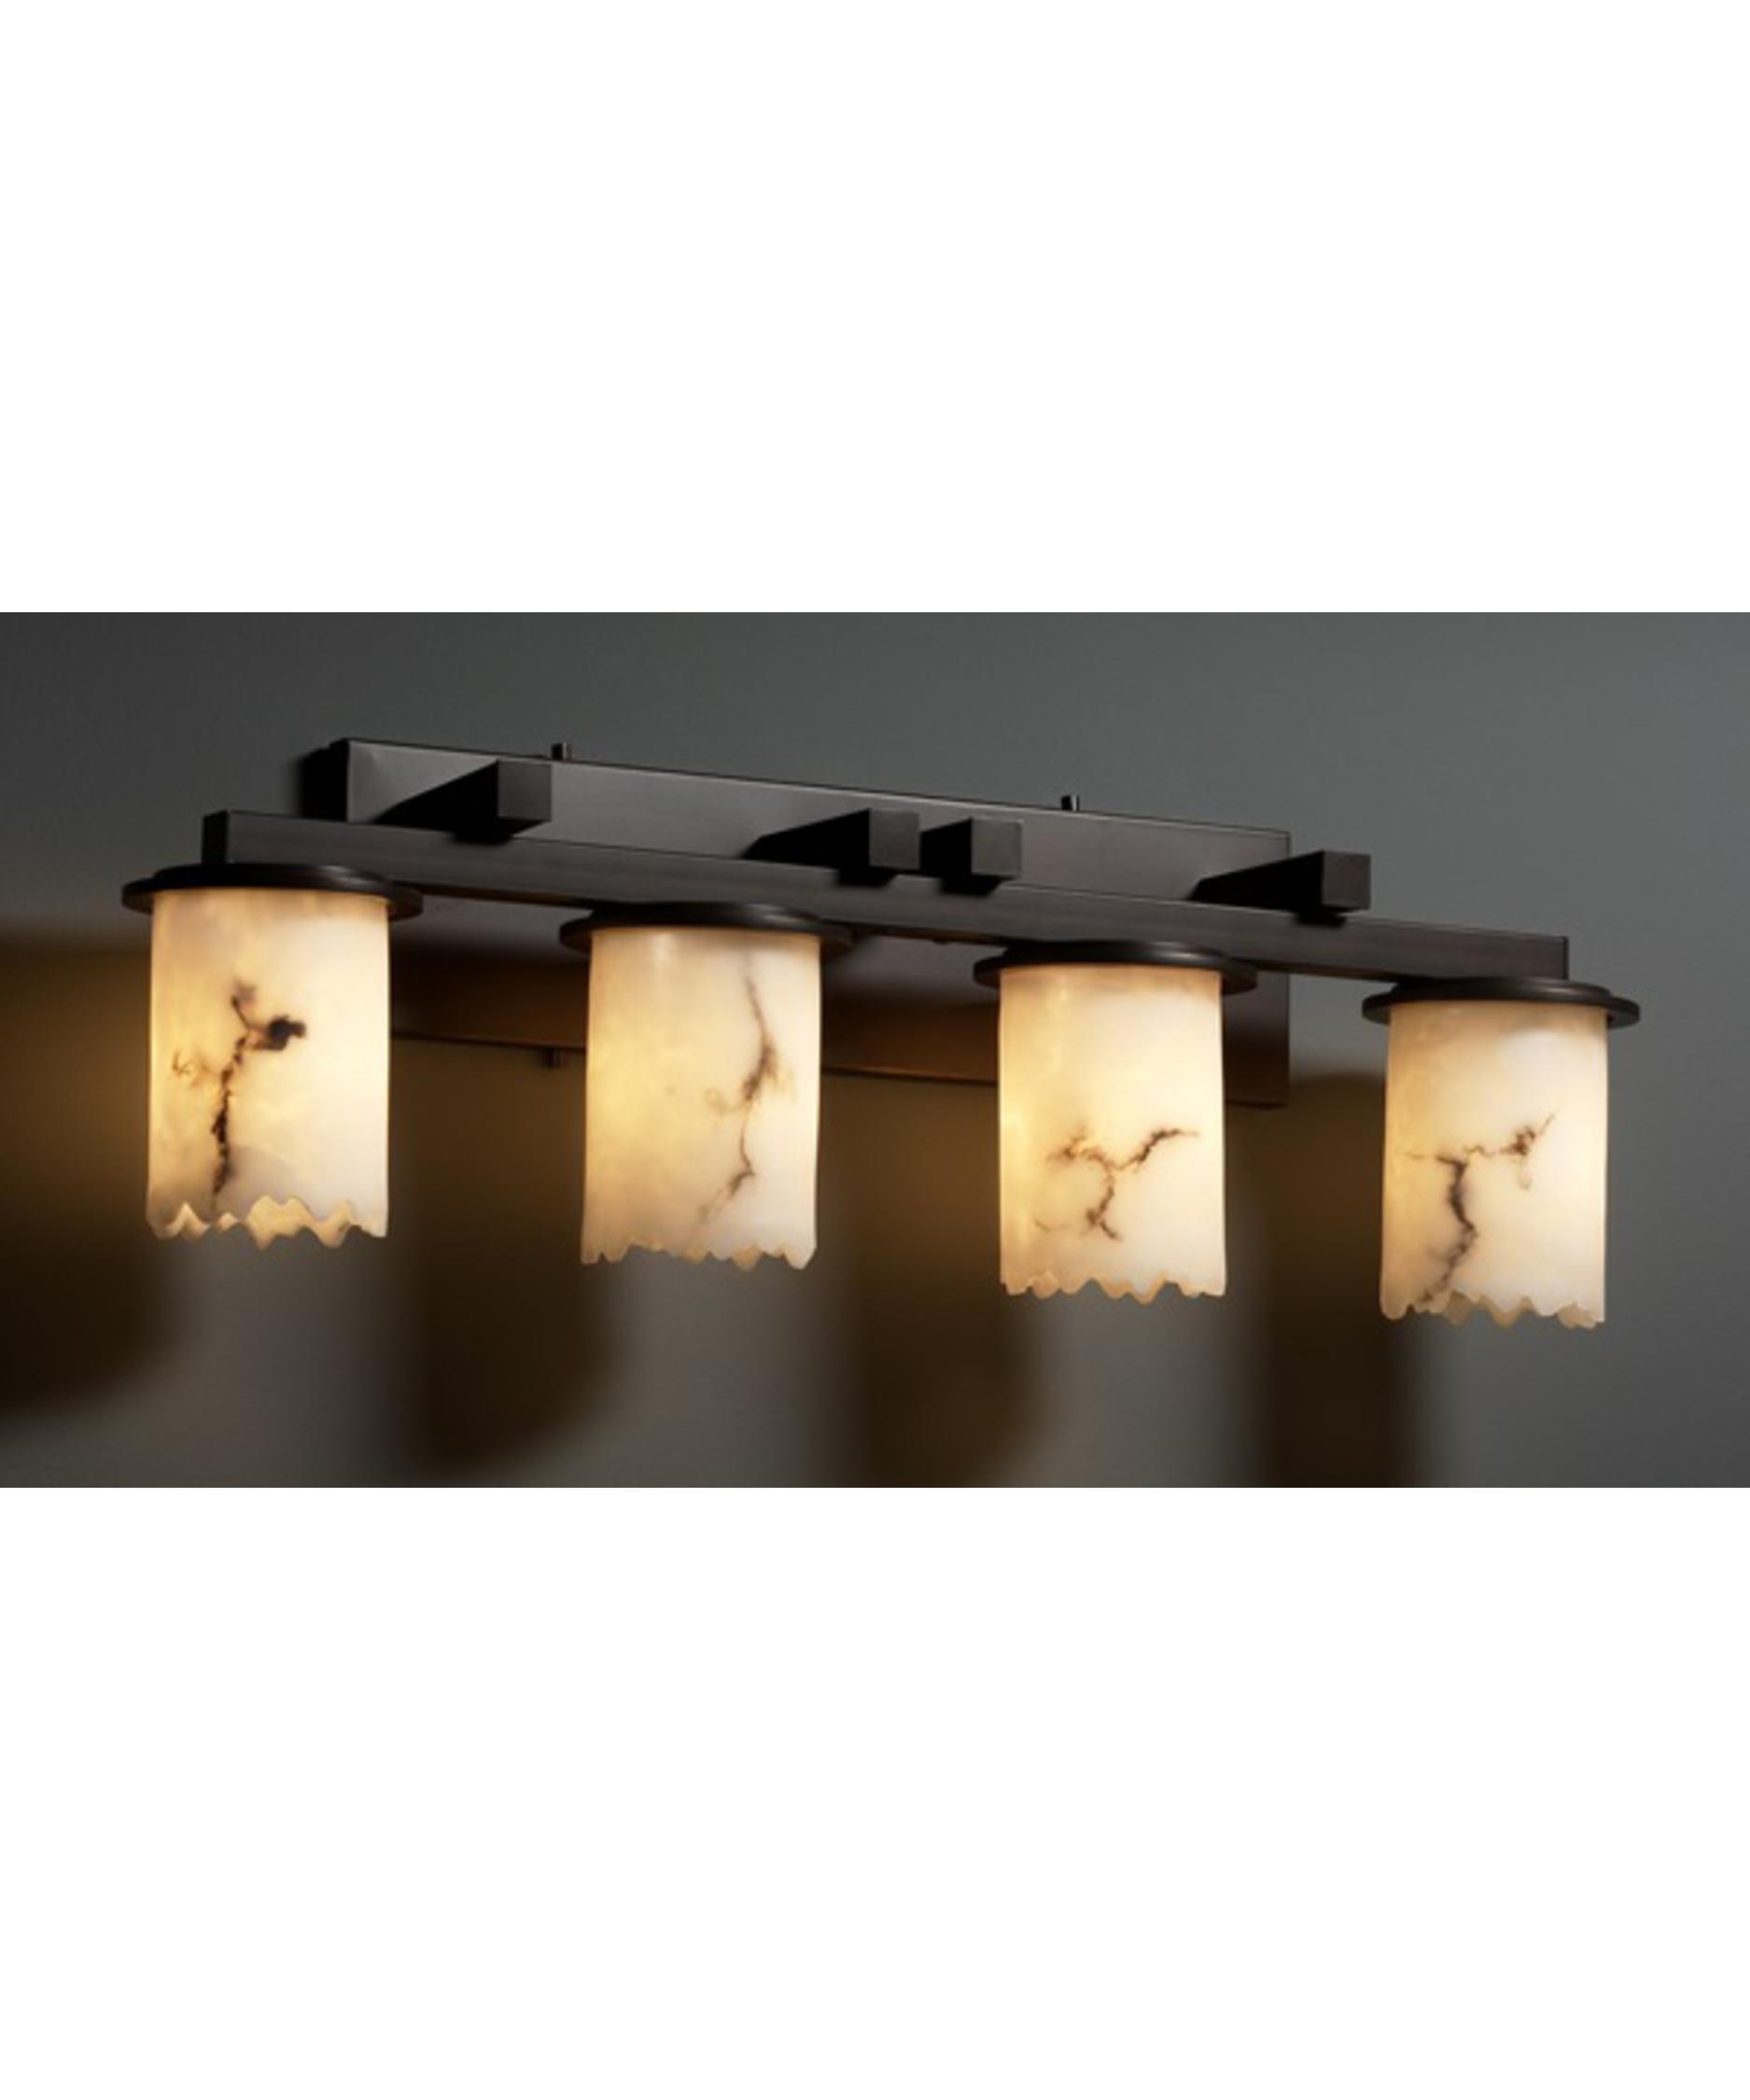 Justice Design Group LumenAria Dakota 29 Inch Bath Vanity Light